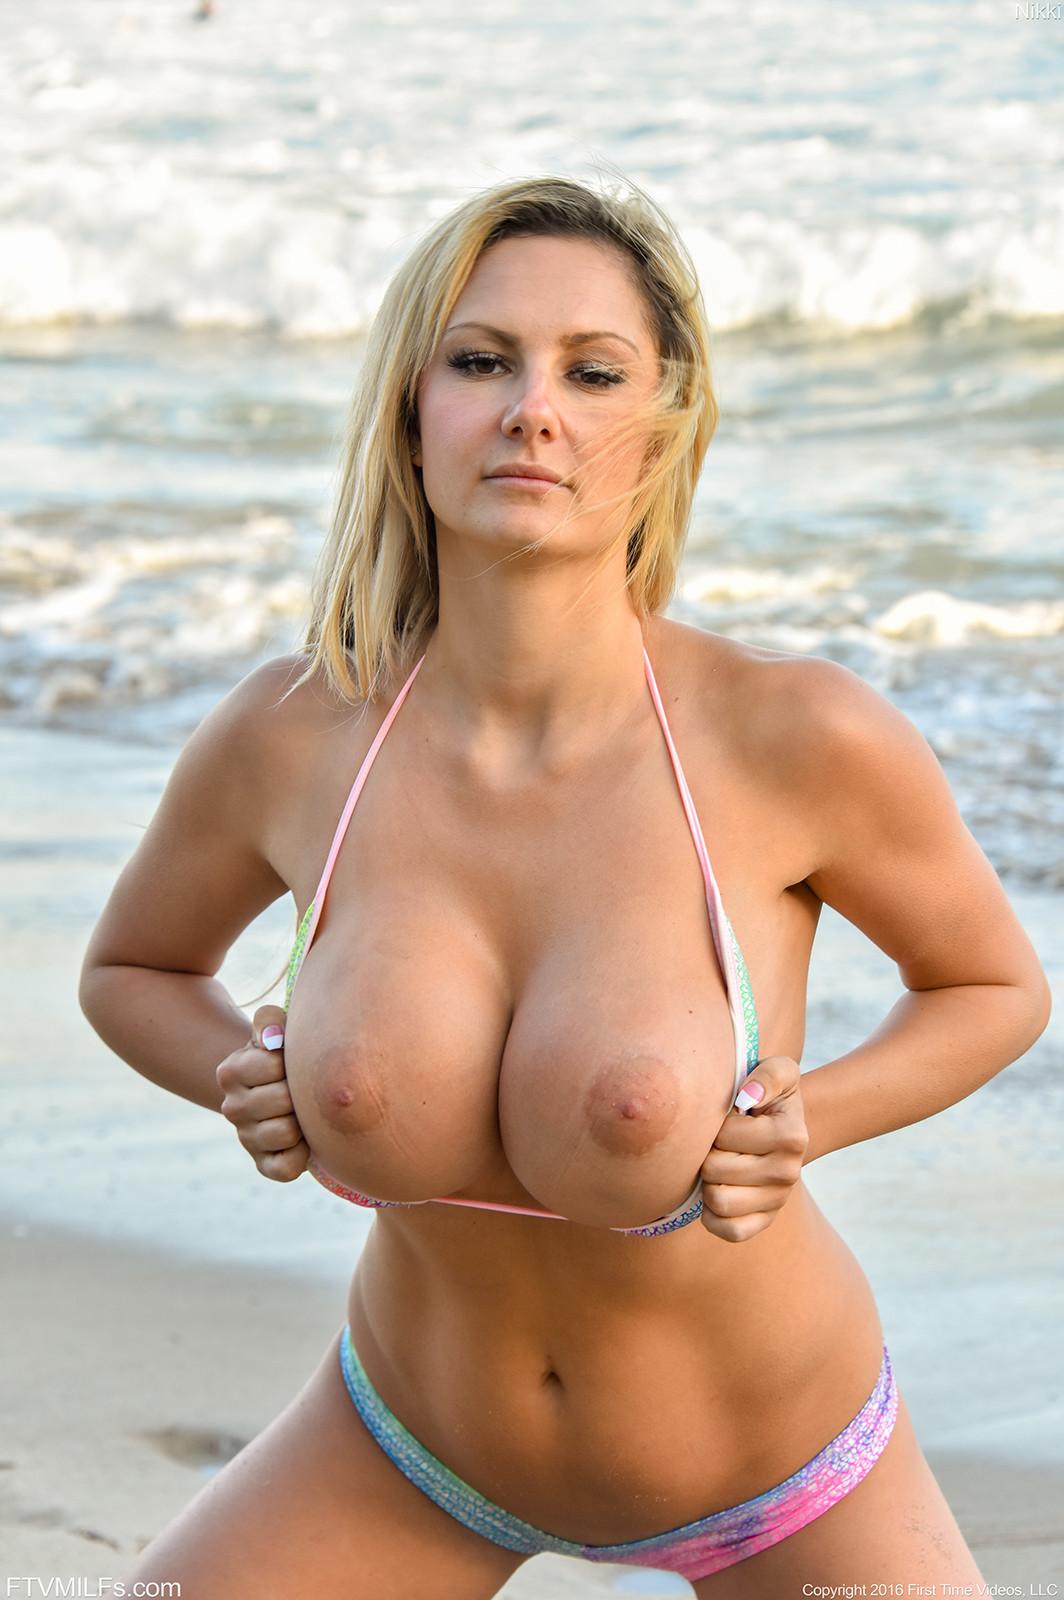 Hot topless mom, american nude fucked girls sex photosh